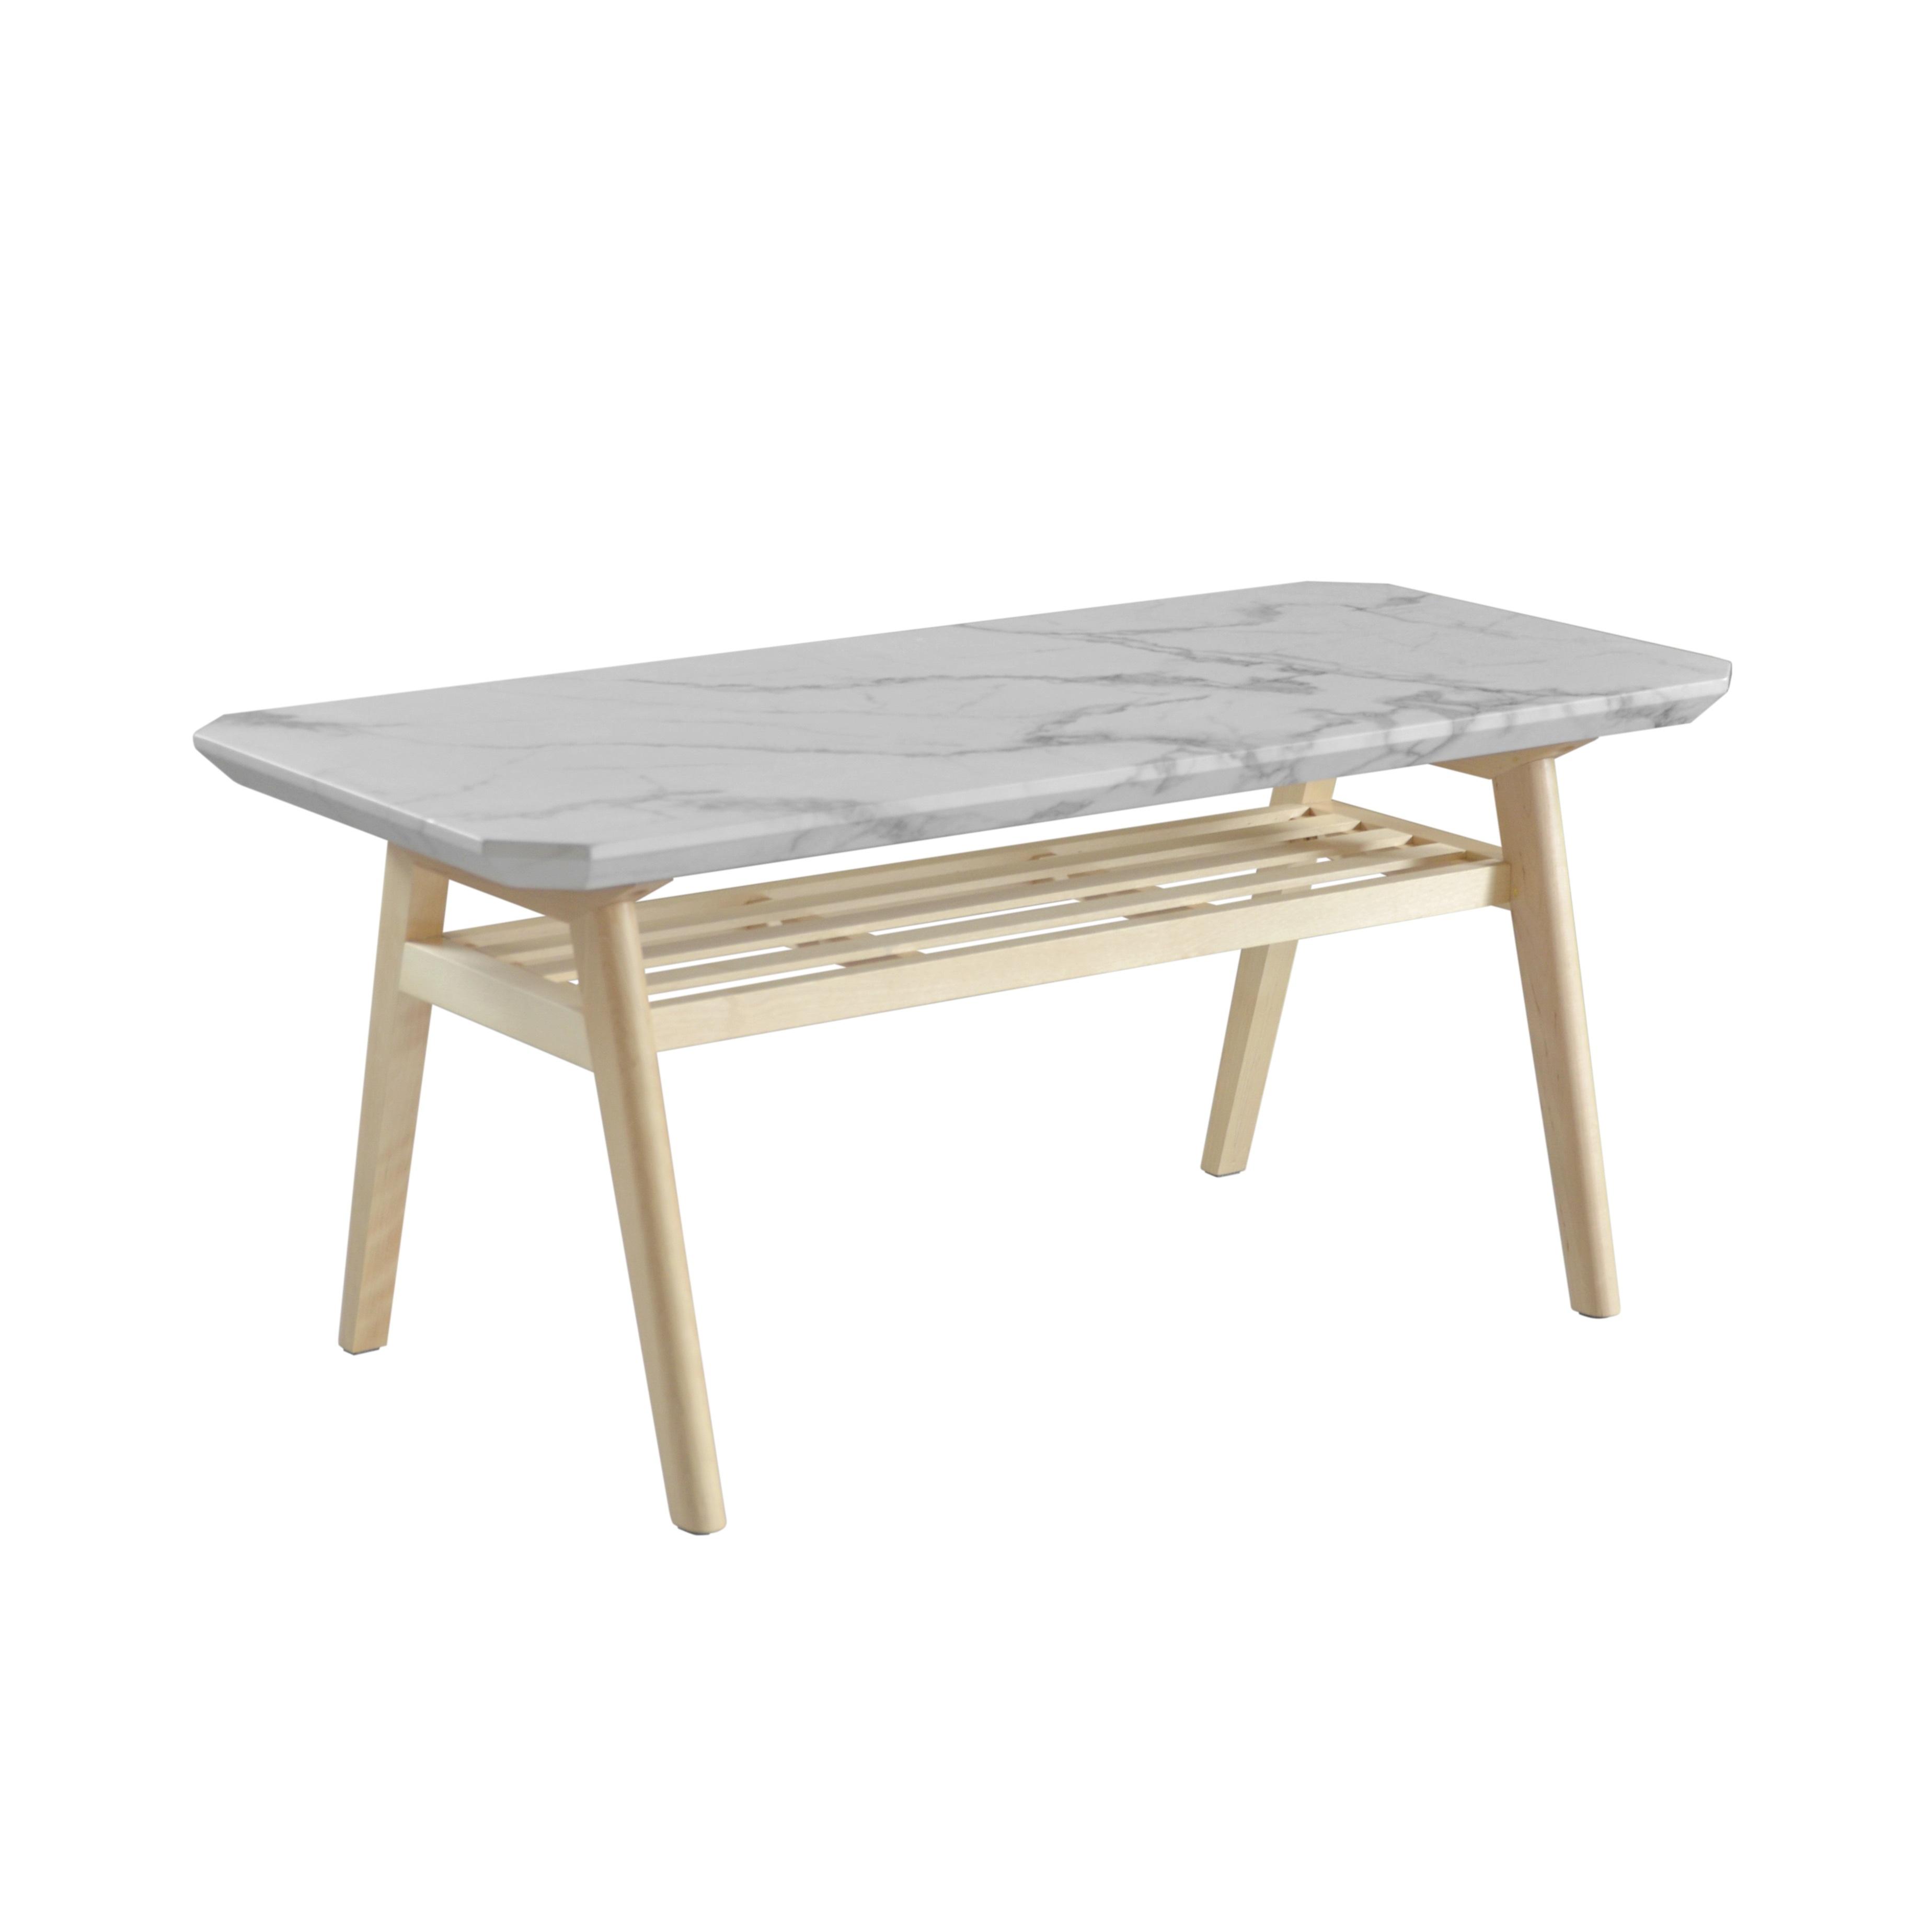 Marble Center Table 900 / 大理石モダンスタイル 大理石調 センターテーブル 900